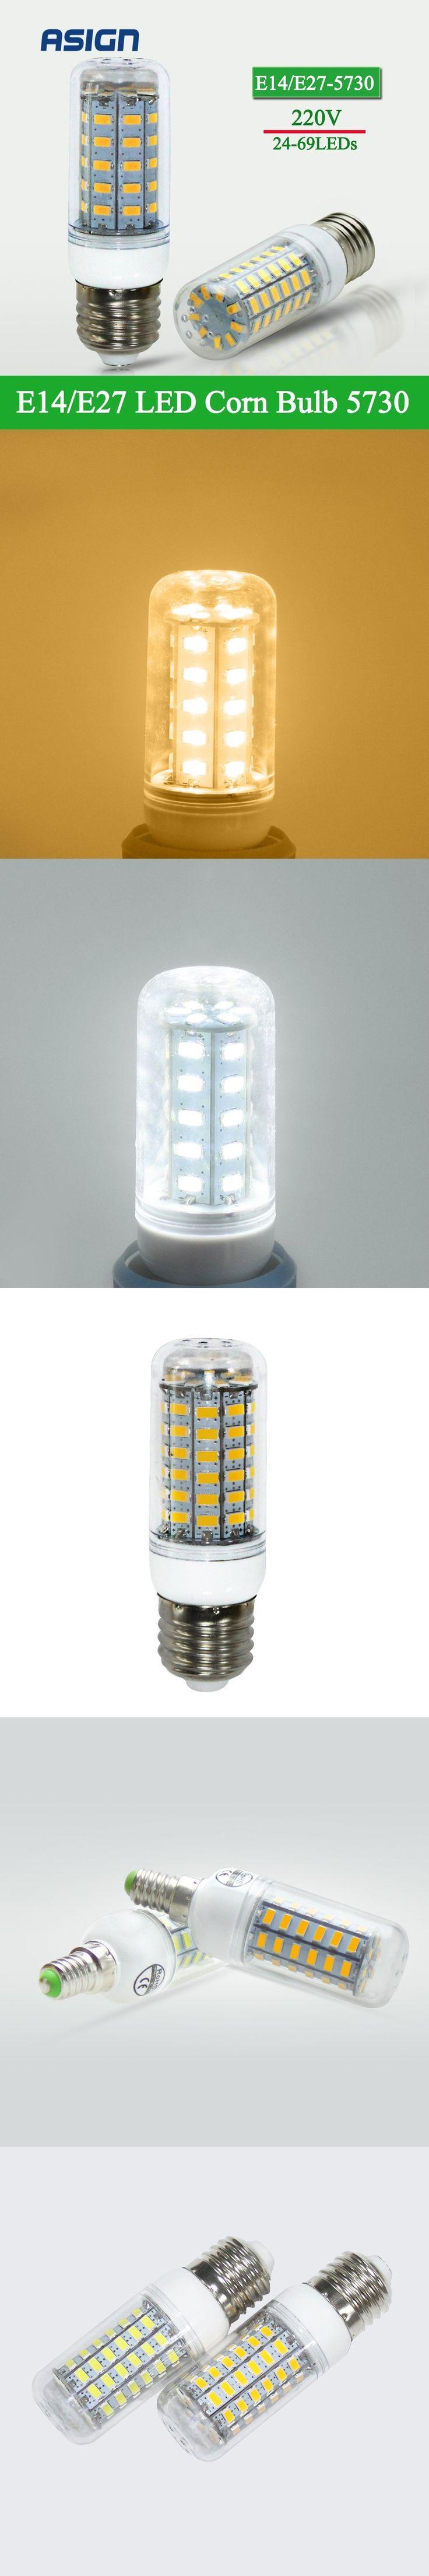 E27 Bulb SMD 5730 E14 LED Lamp LED Lights Corn Led Bulb 24 36 48 56 69 72Leds Chandelier Candle Lighting Home Decoration $1.95